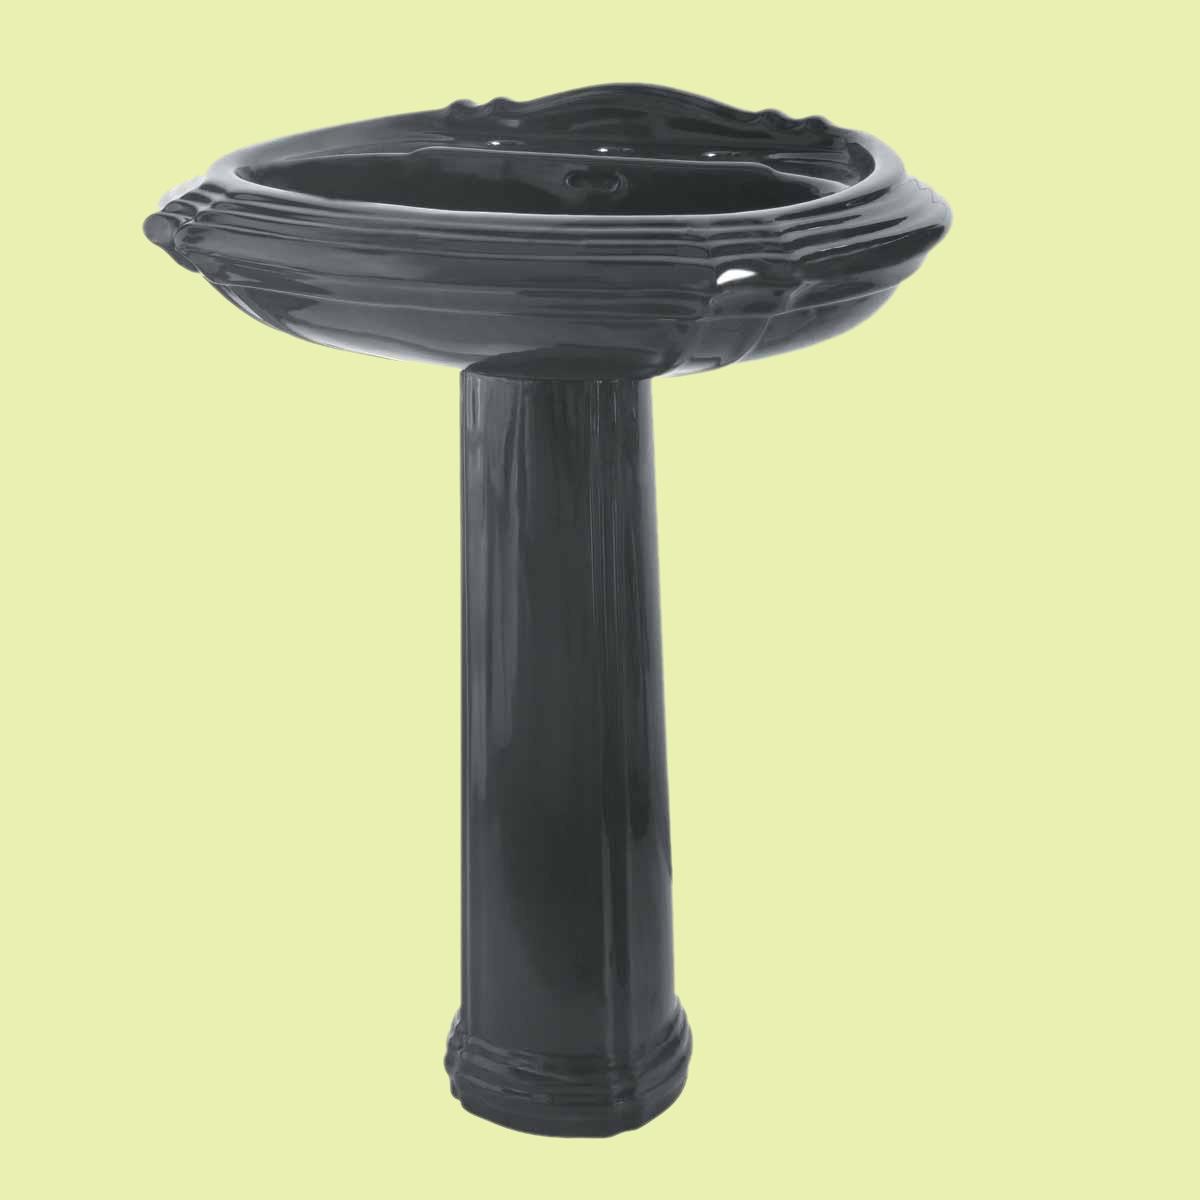 Black Pedestal Sink : Classic Pedestal Sink Black Bathroom 4